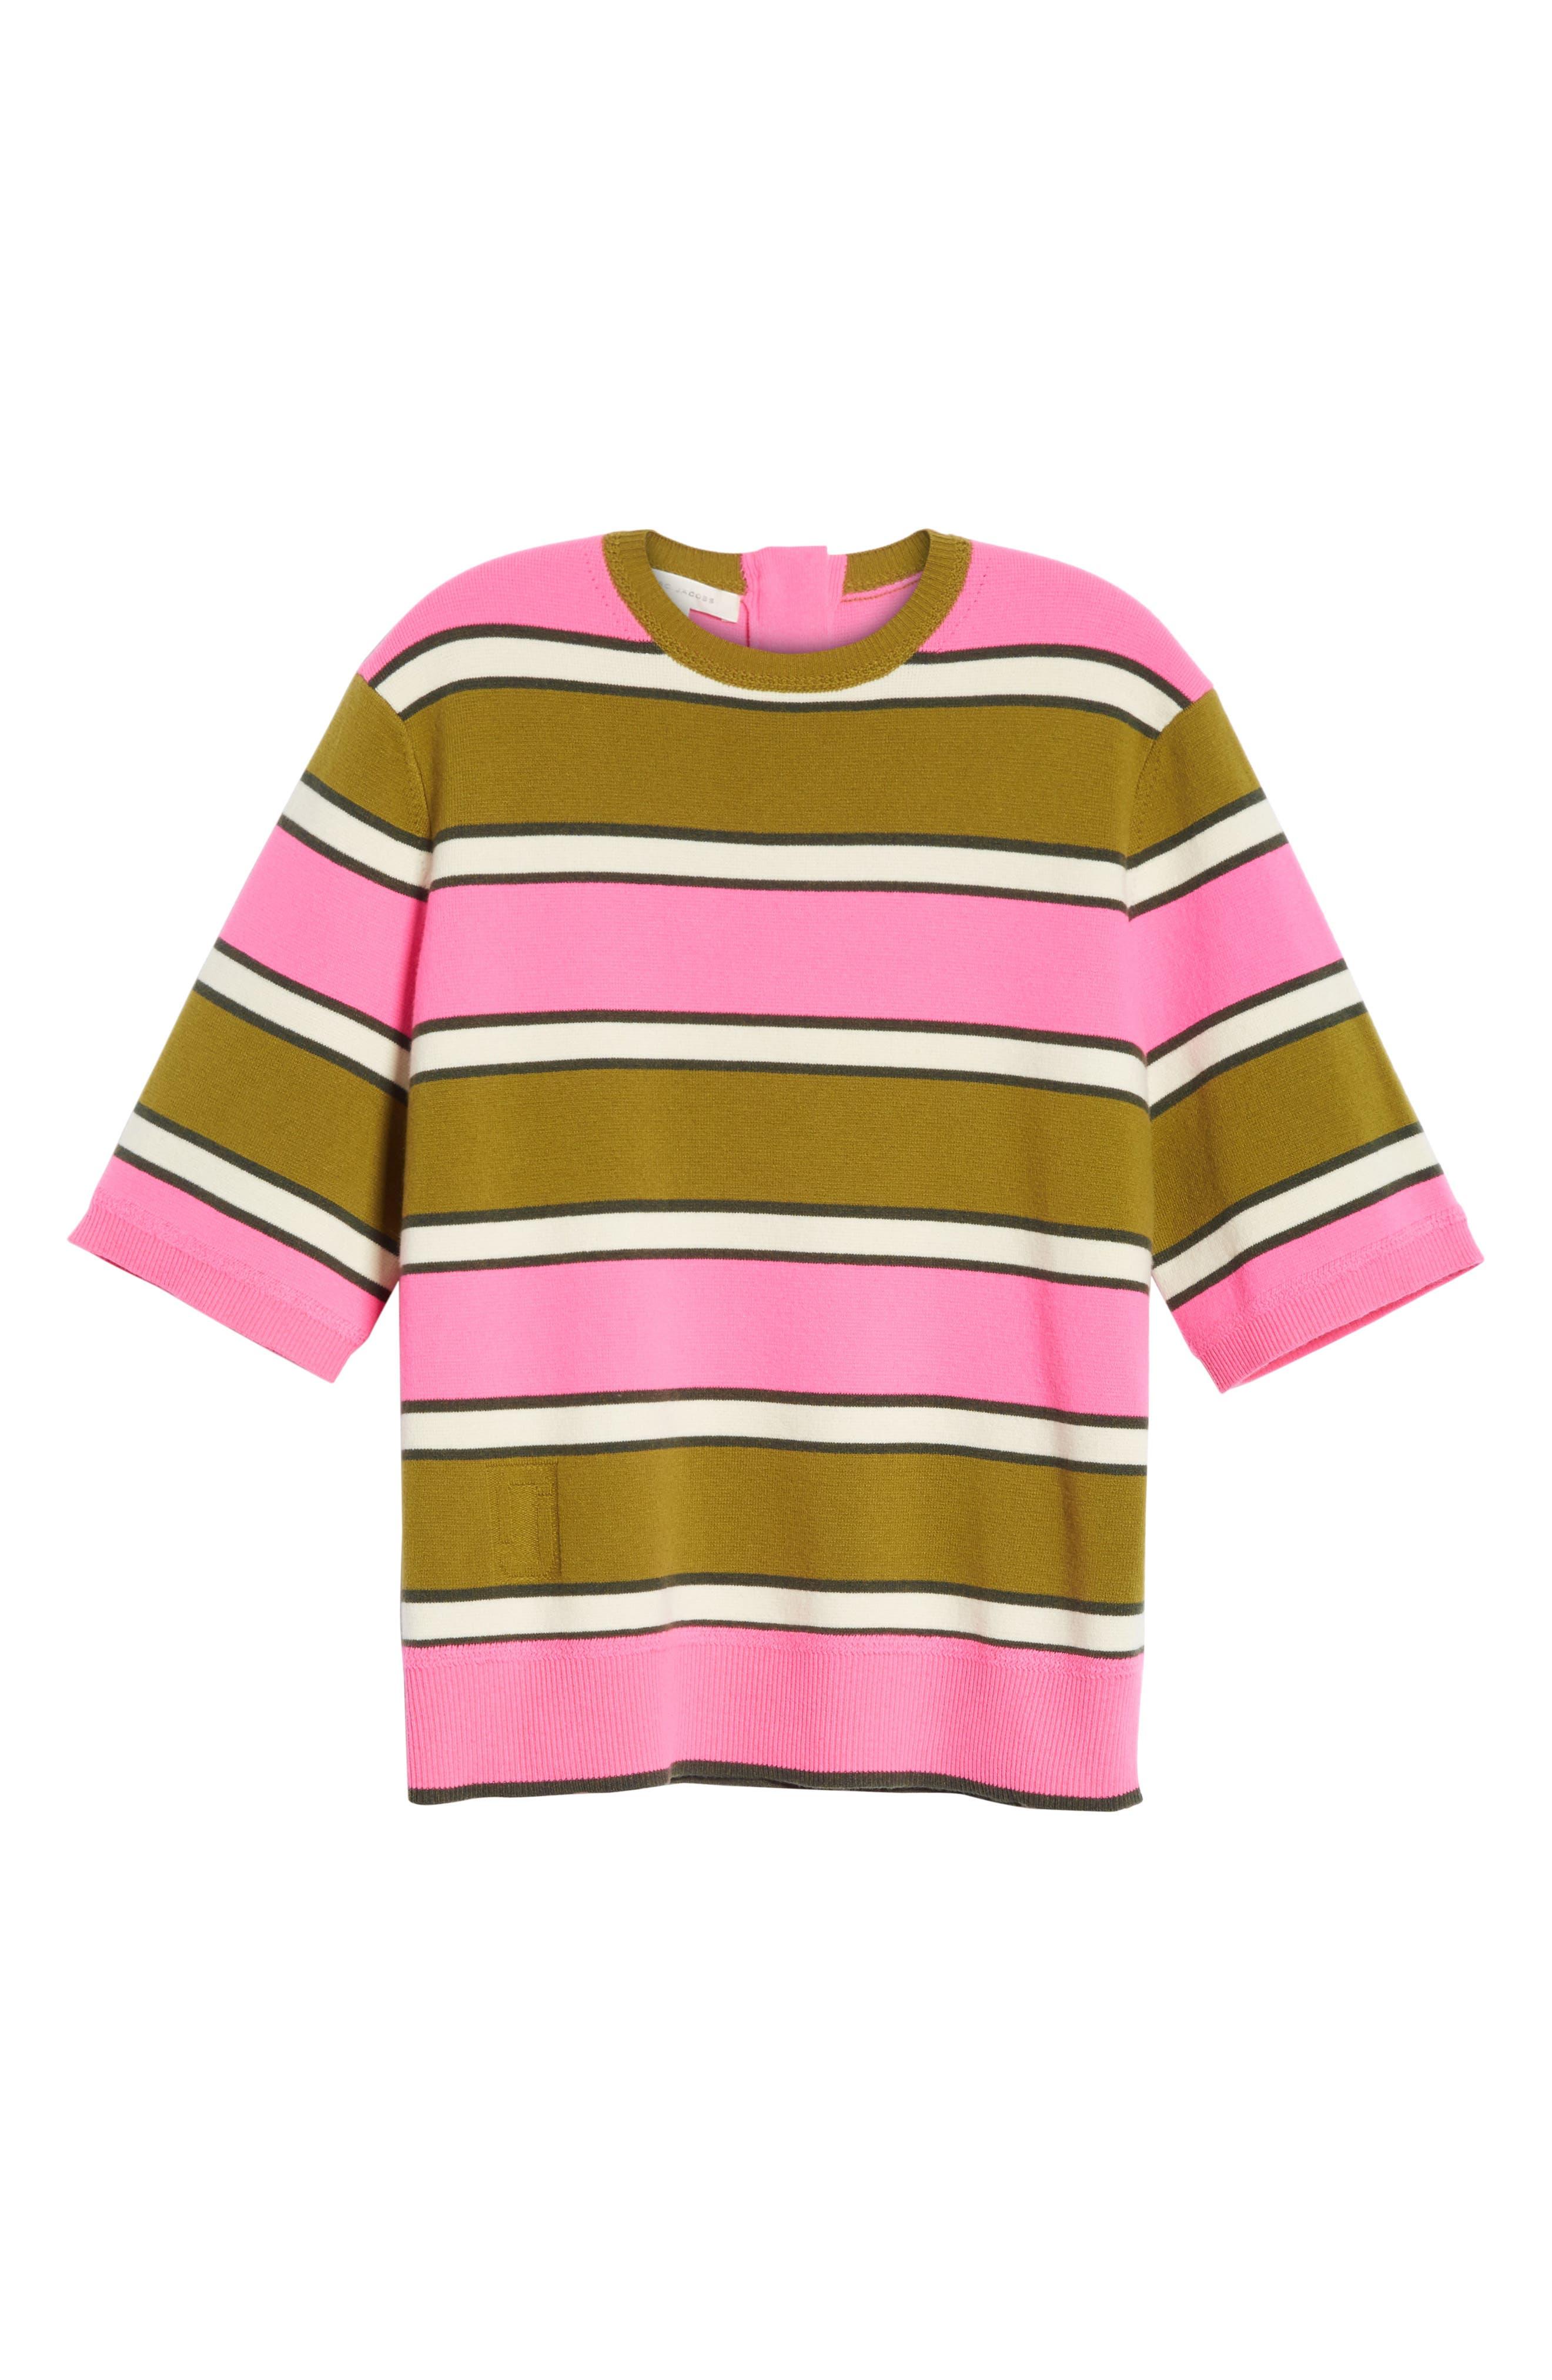 Oversize Stripe Cashmere Sweater,                             Alternate thumbnail 7, color,                             Pink Multi